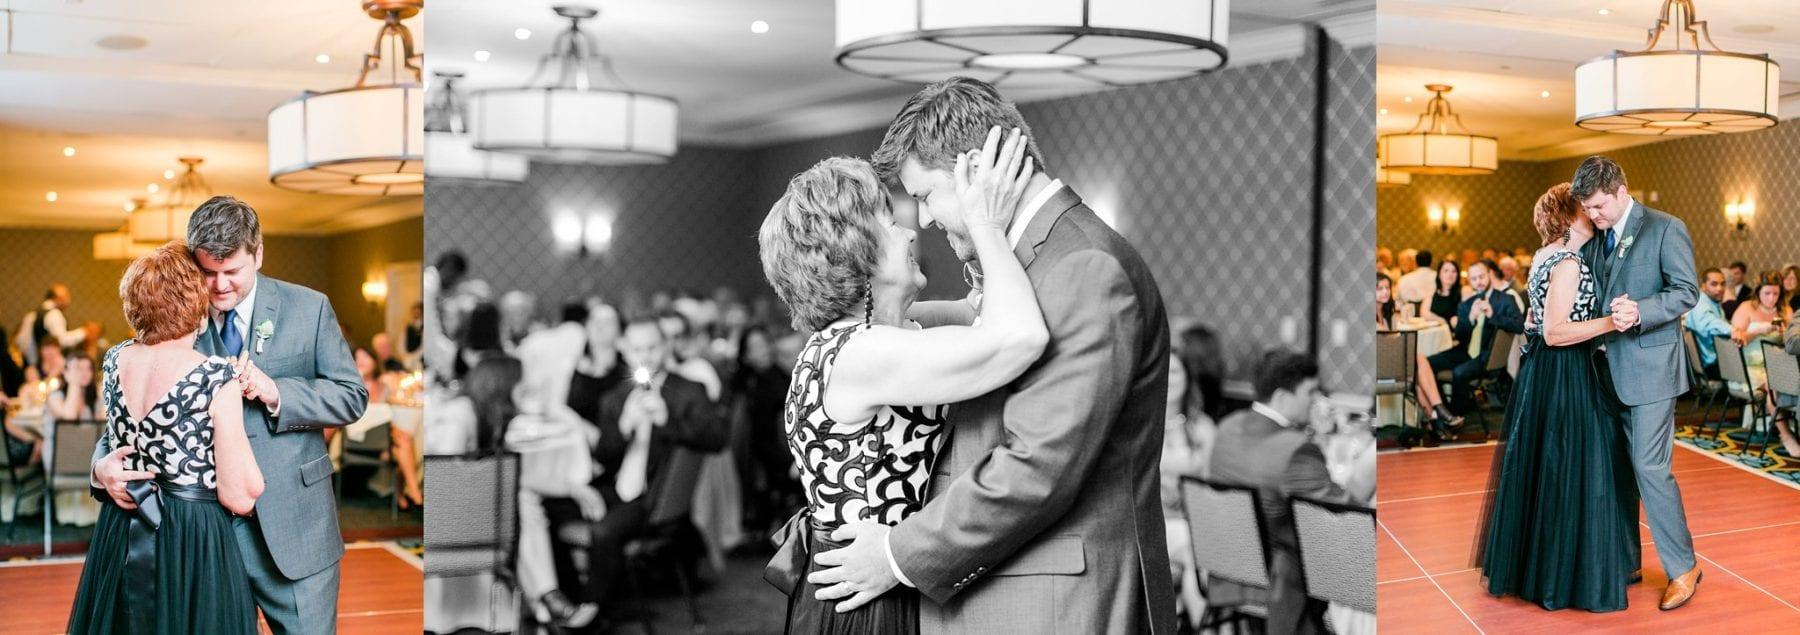 Hotel Monaco Wedding Photos Virginia Wedding Photographer Megan Kelsey Photography Kevin & Morgan-705.JPG